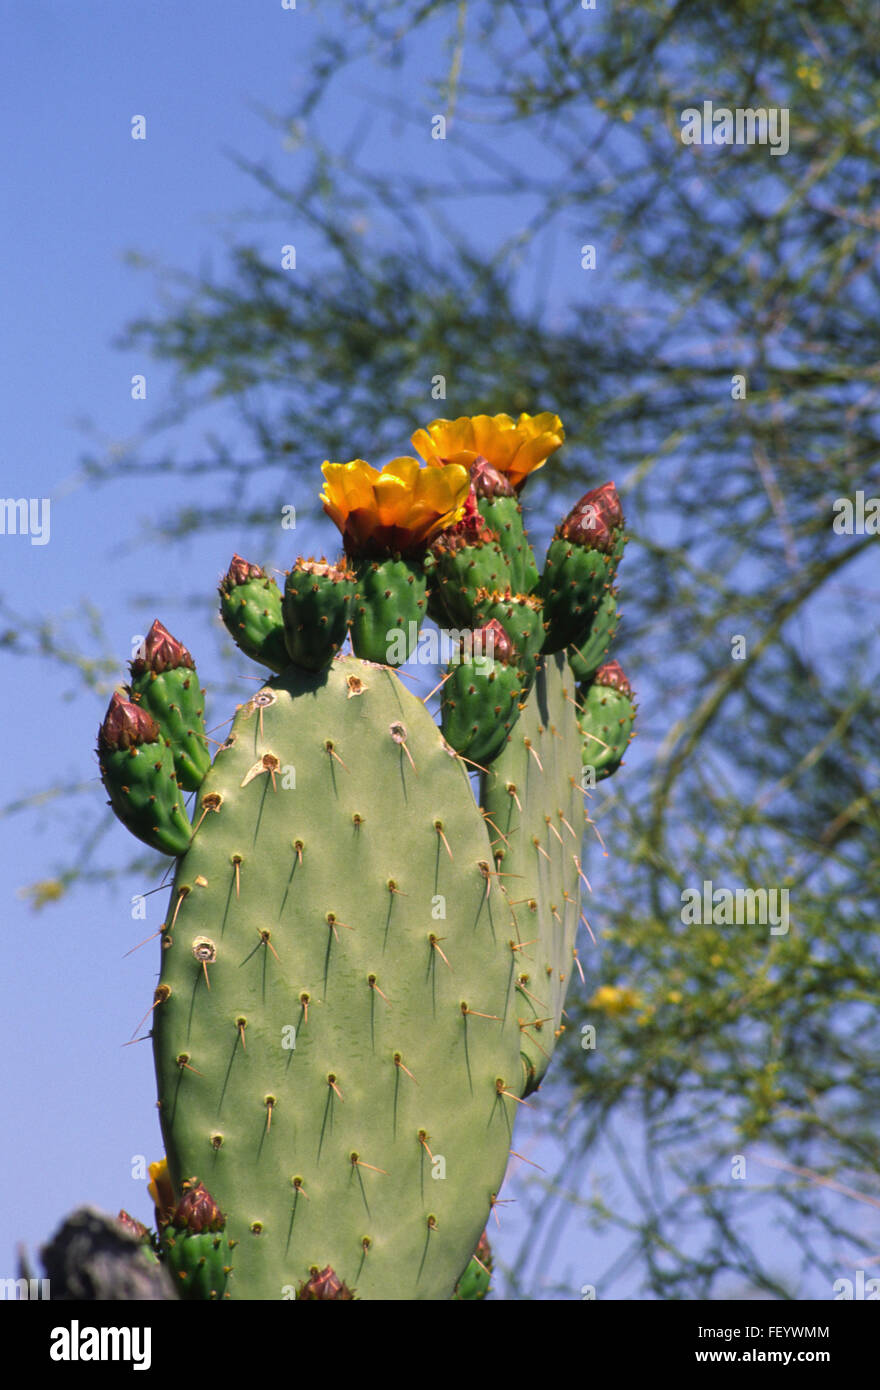 Flowering Prickly Pear Cactus    Opuntia - Stock Image